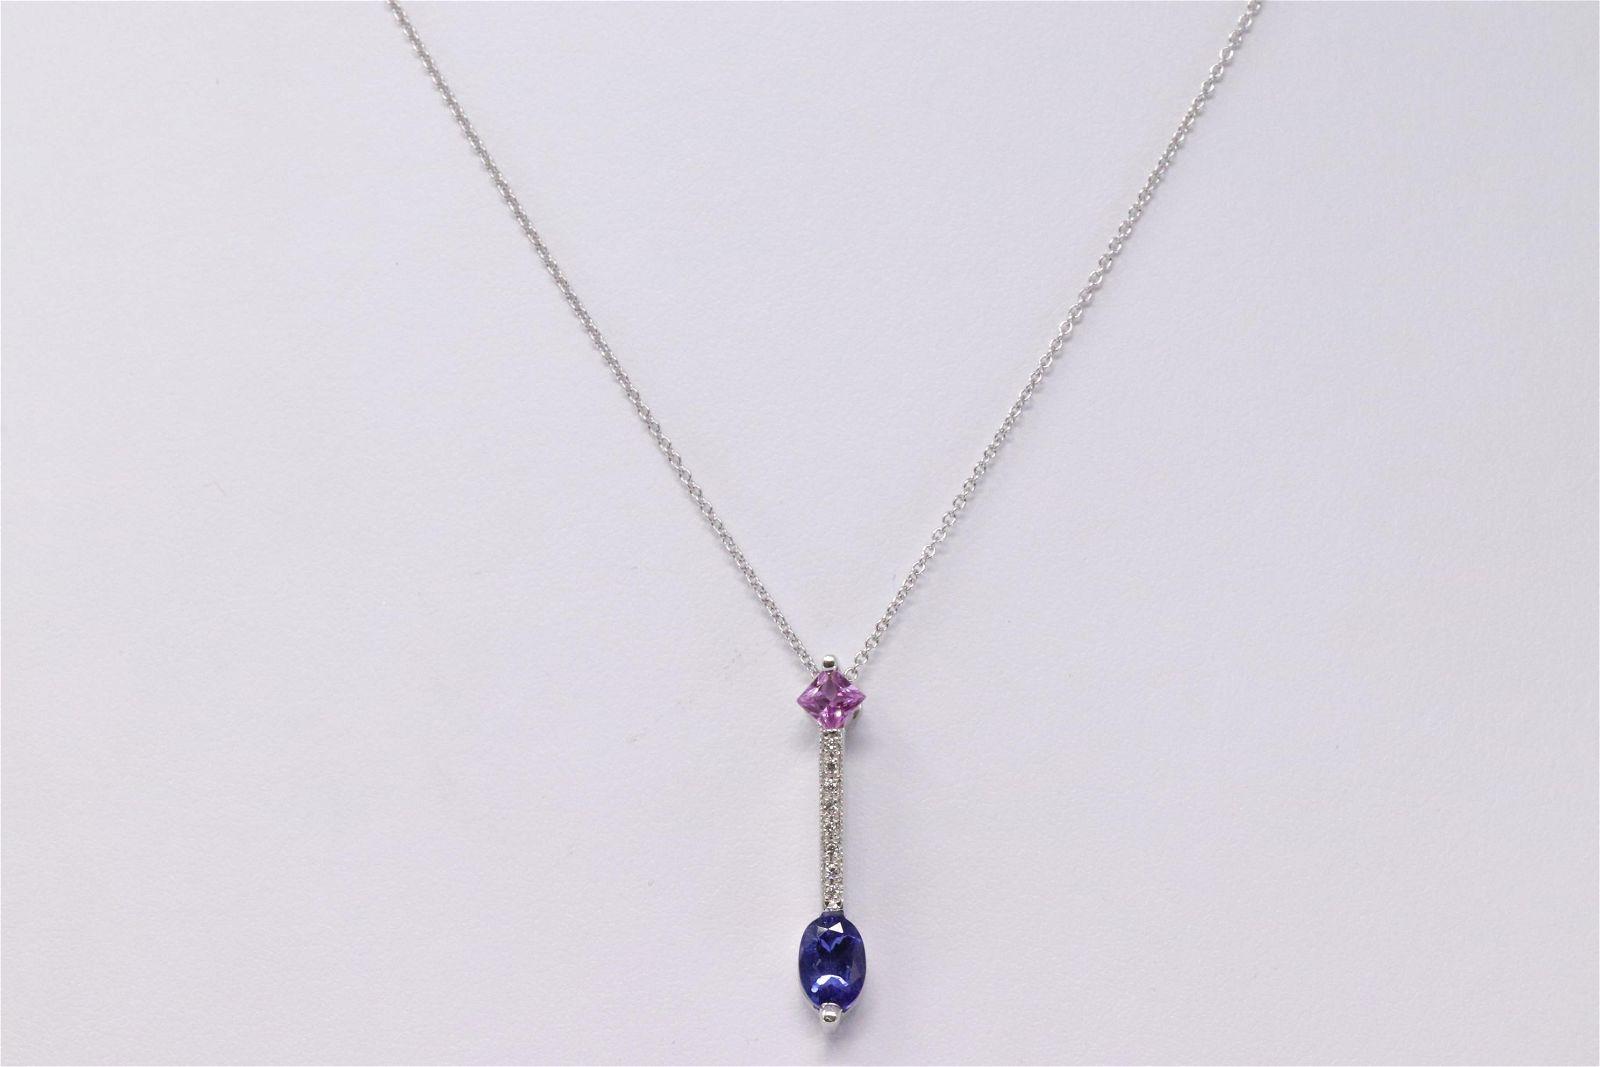 14Kt Diamond Pendant & Oval Shape Tanzanite.